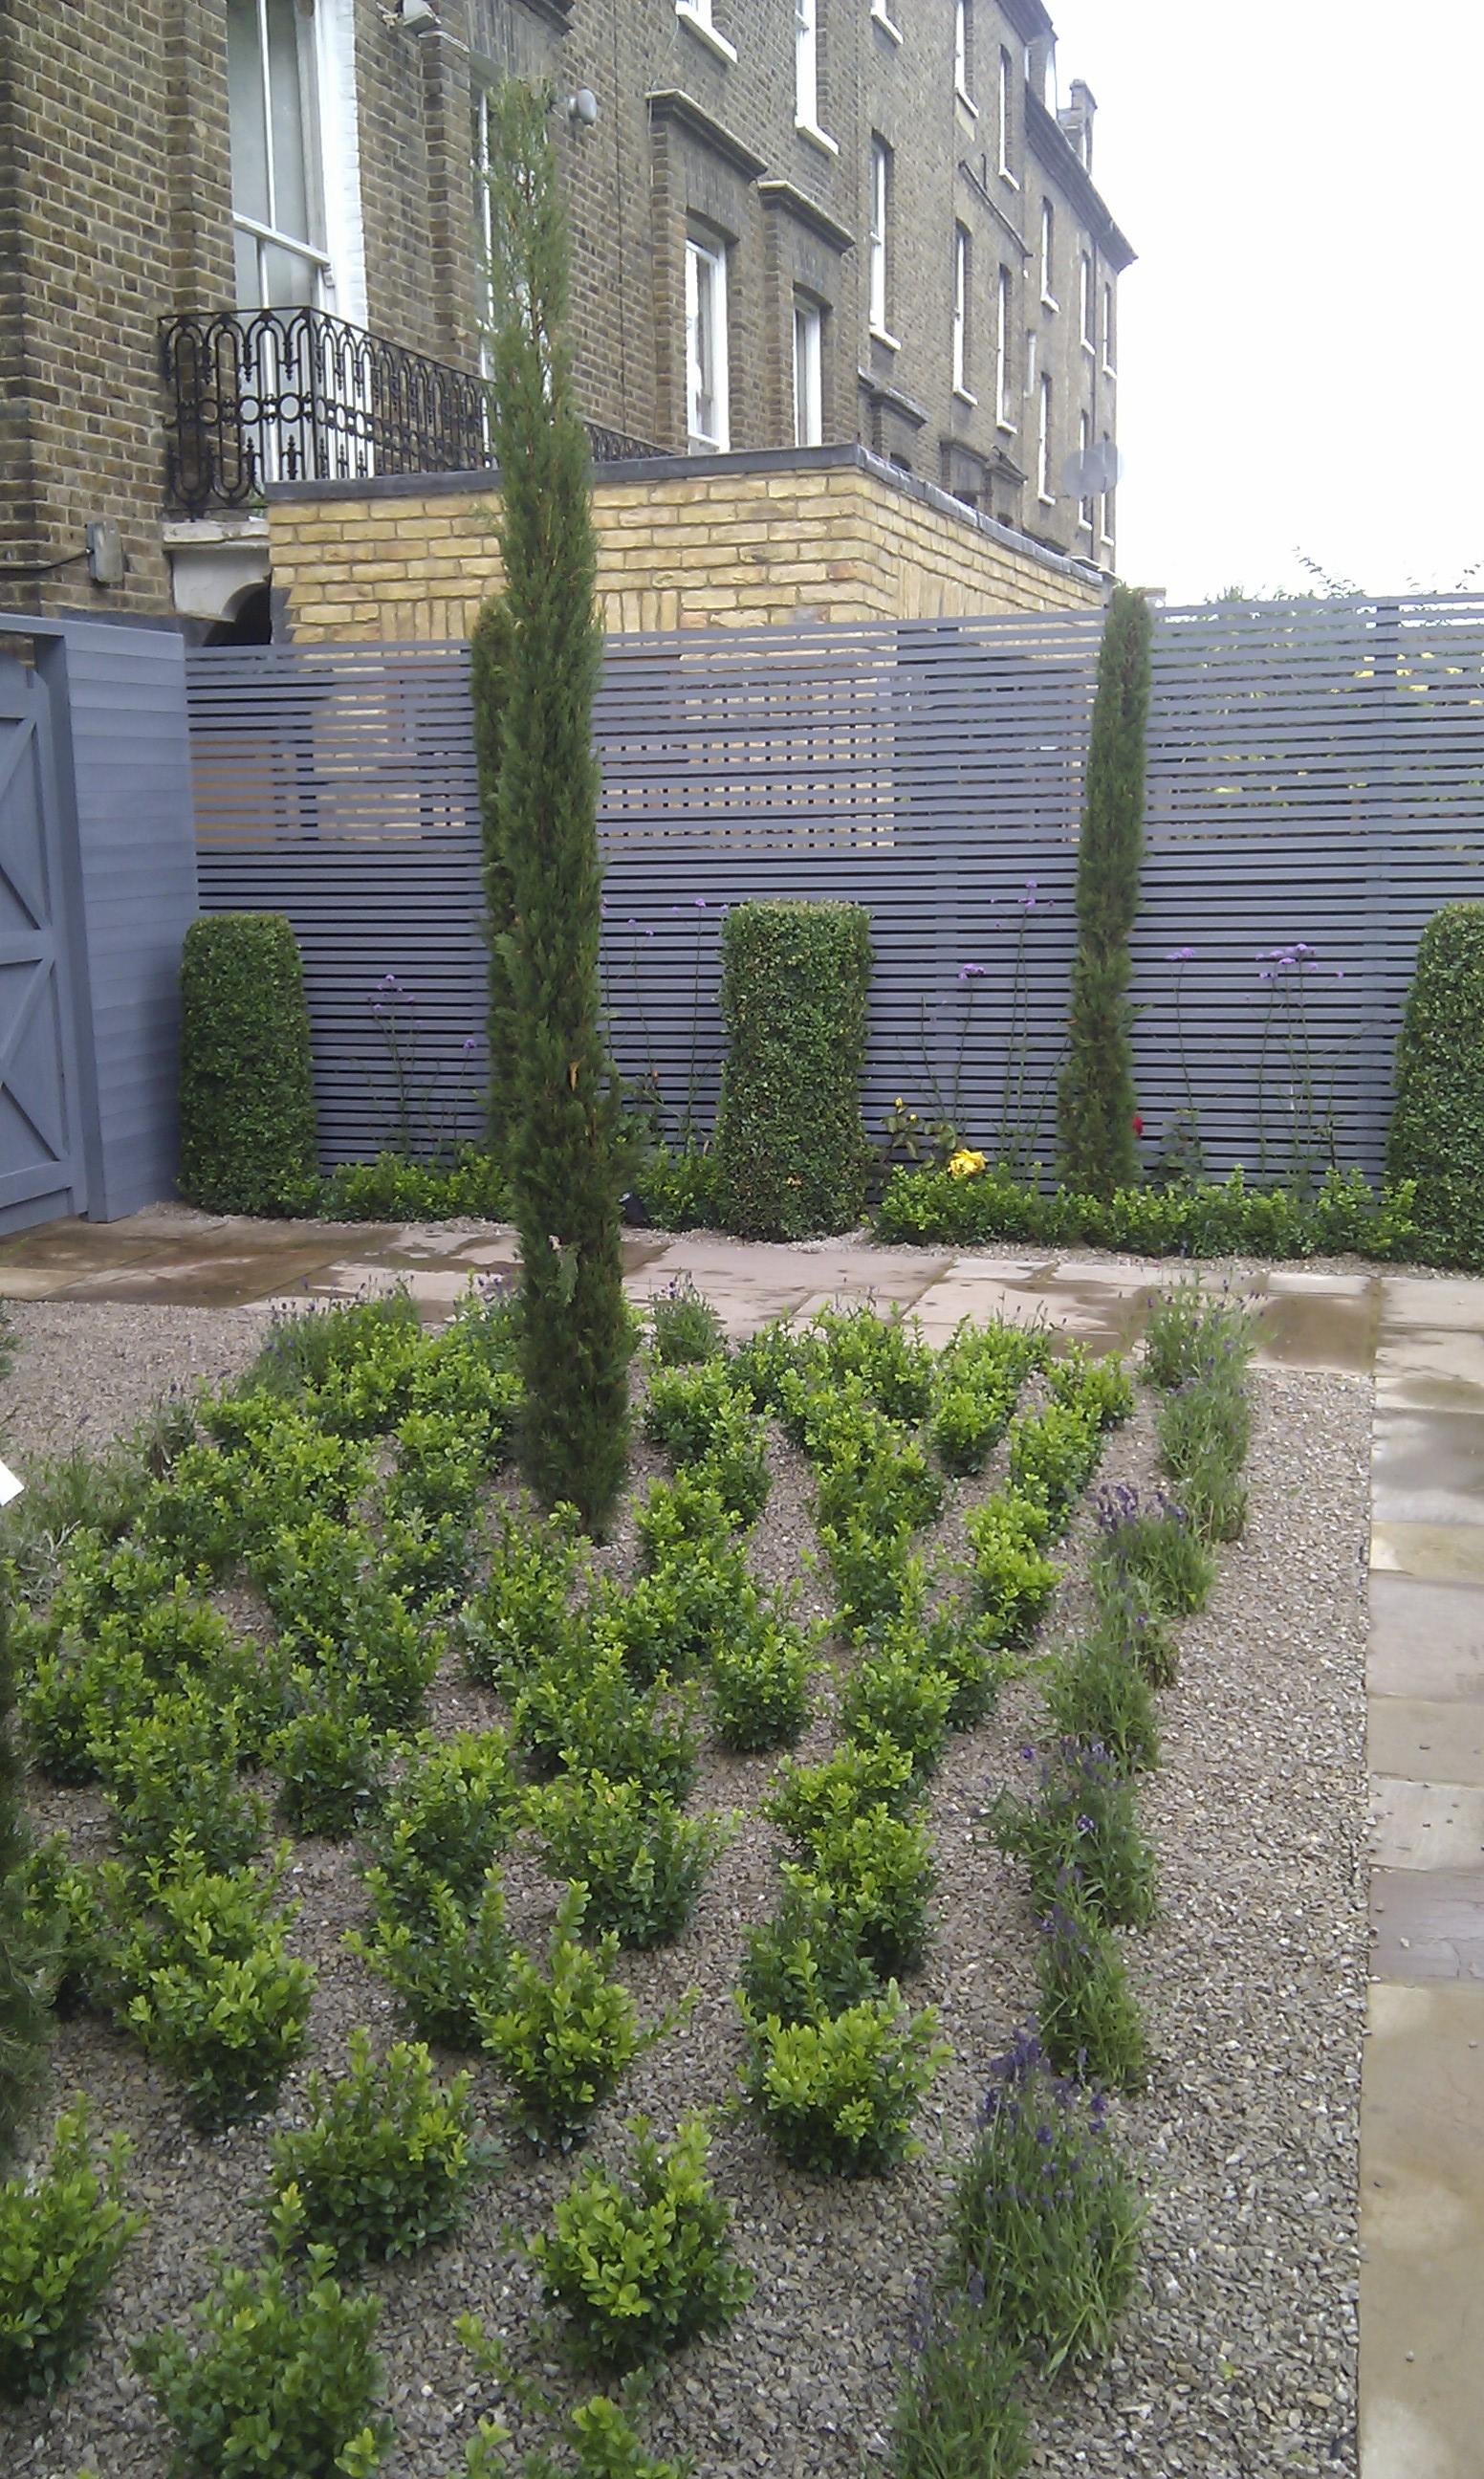 modern garden design london slatted grey privacy screen sandstone paving easy grass balau hardwood decking (16)